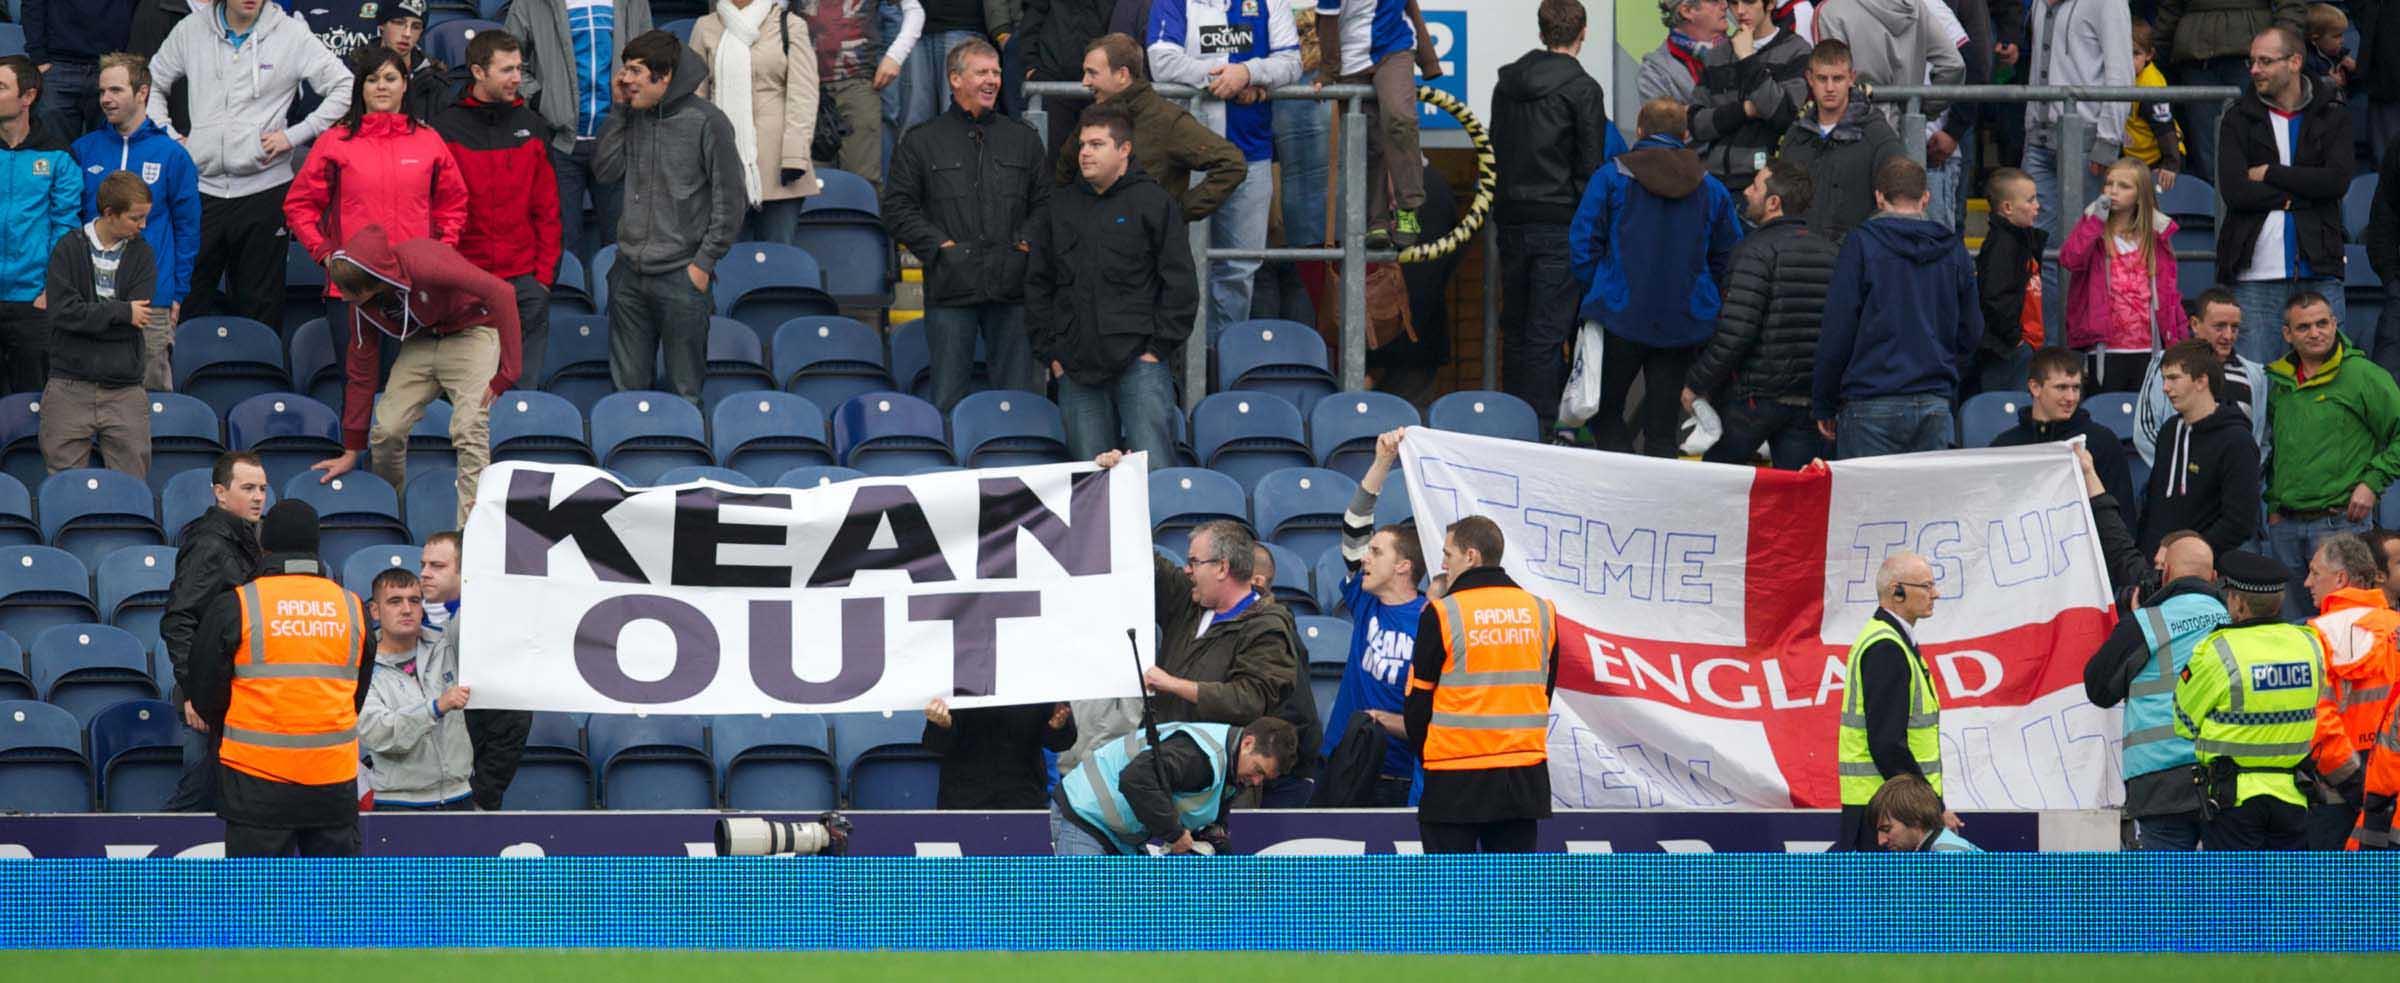 Football - FA Premier League - Blackburn Rovers FC v Tottenham Hotspur FC